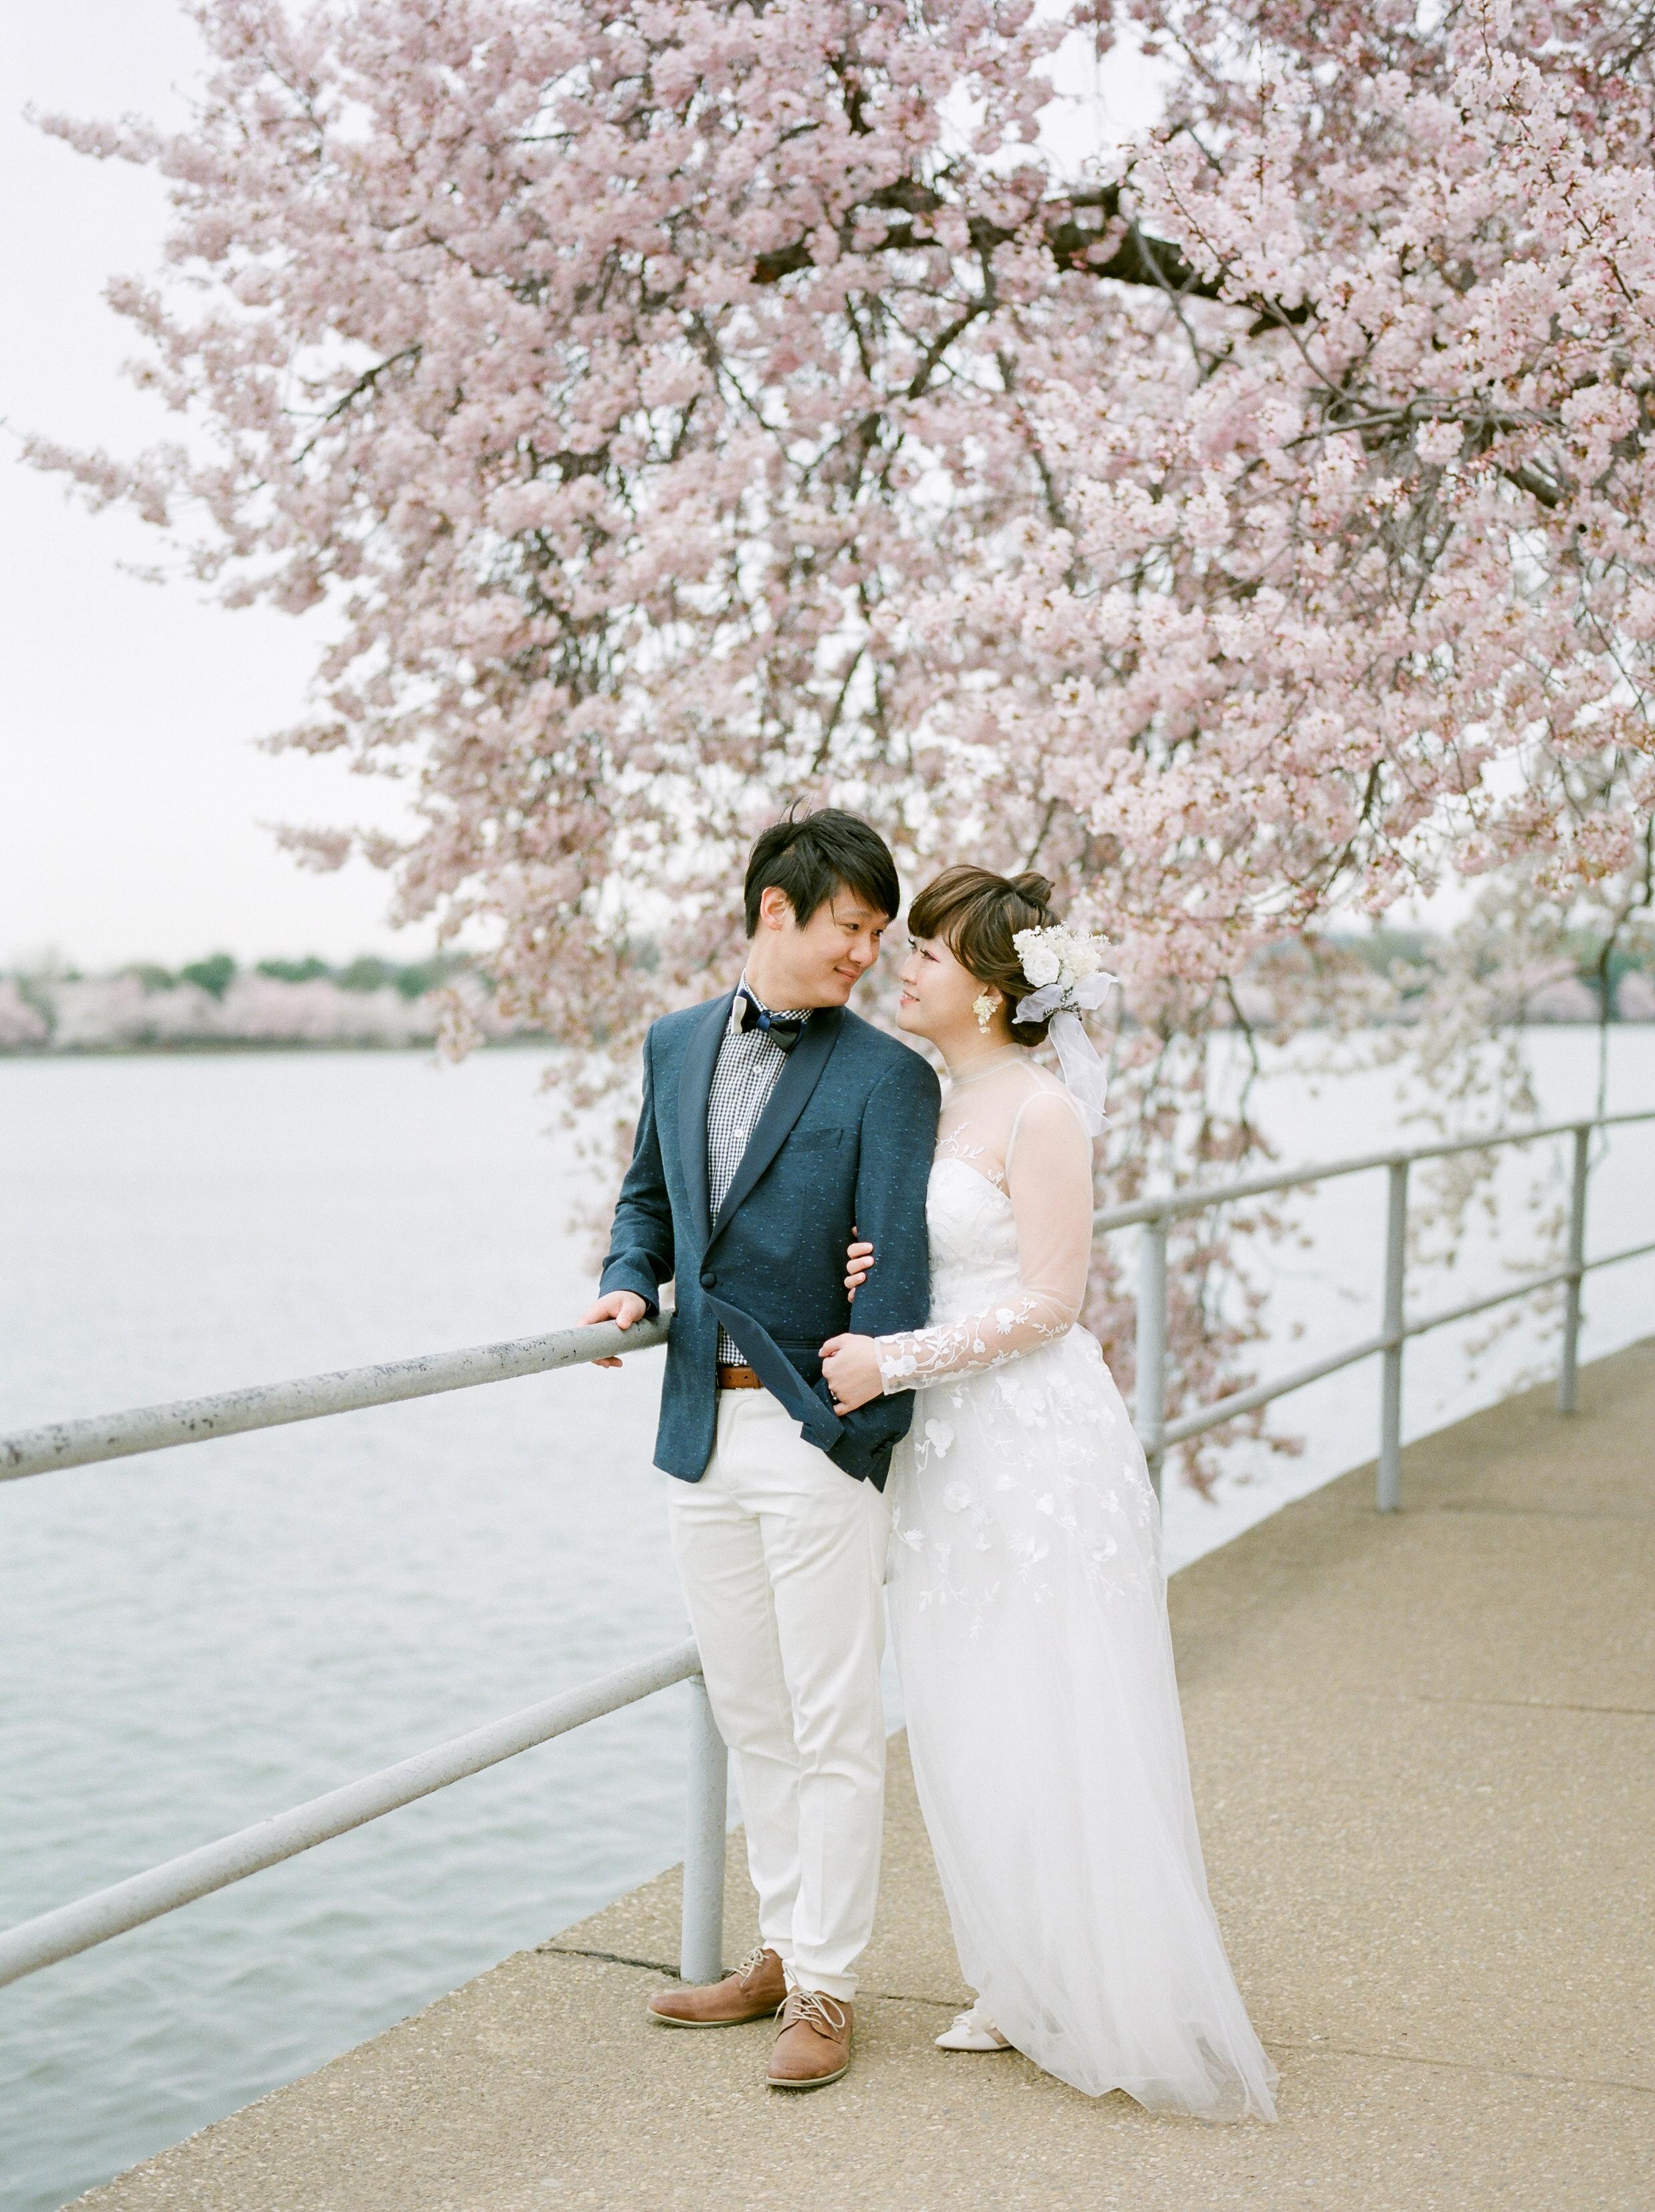 nyc-cherry-blossom-engagement-108.jpg